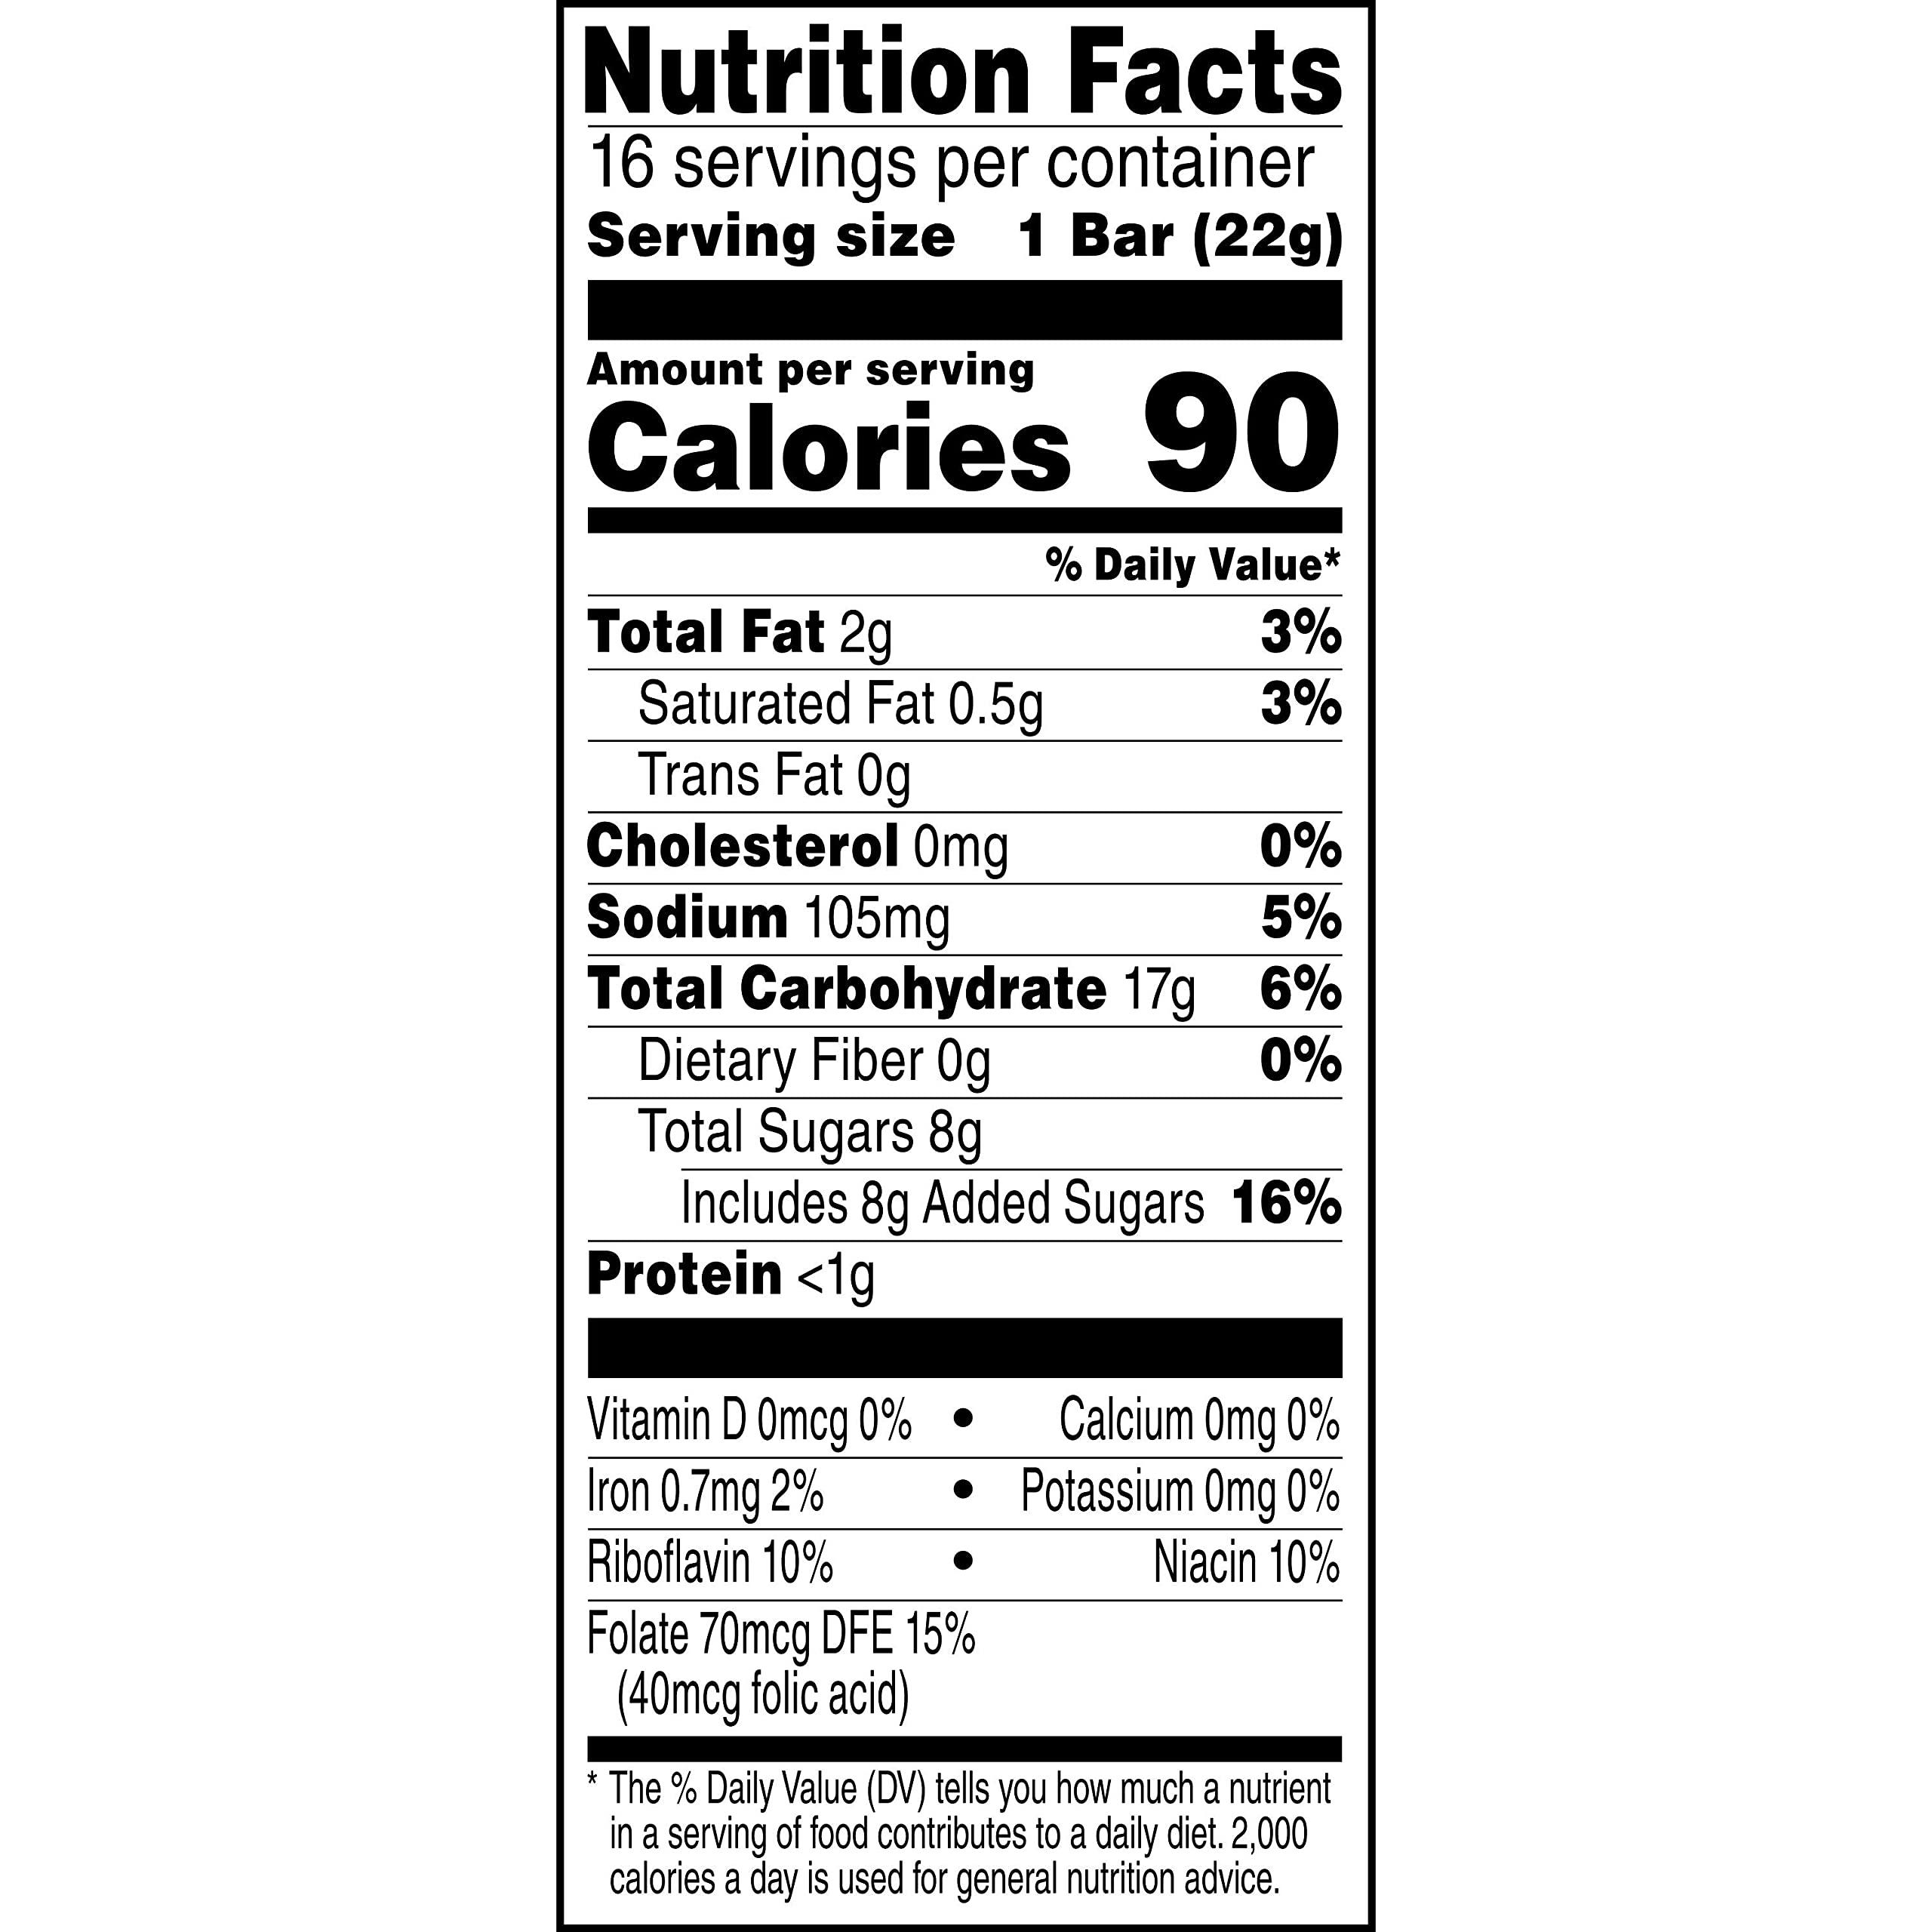 Rice Krispies Treats Marshmallow Snack Bars, Kids Snacks, School Lunch, Value Pack, Original, 12.4oz Box (16 Bars)